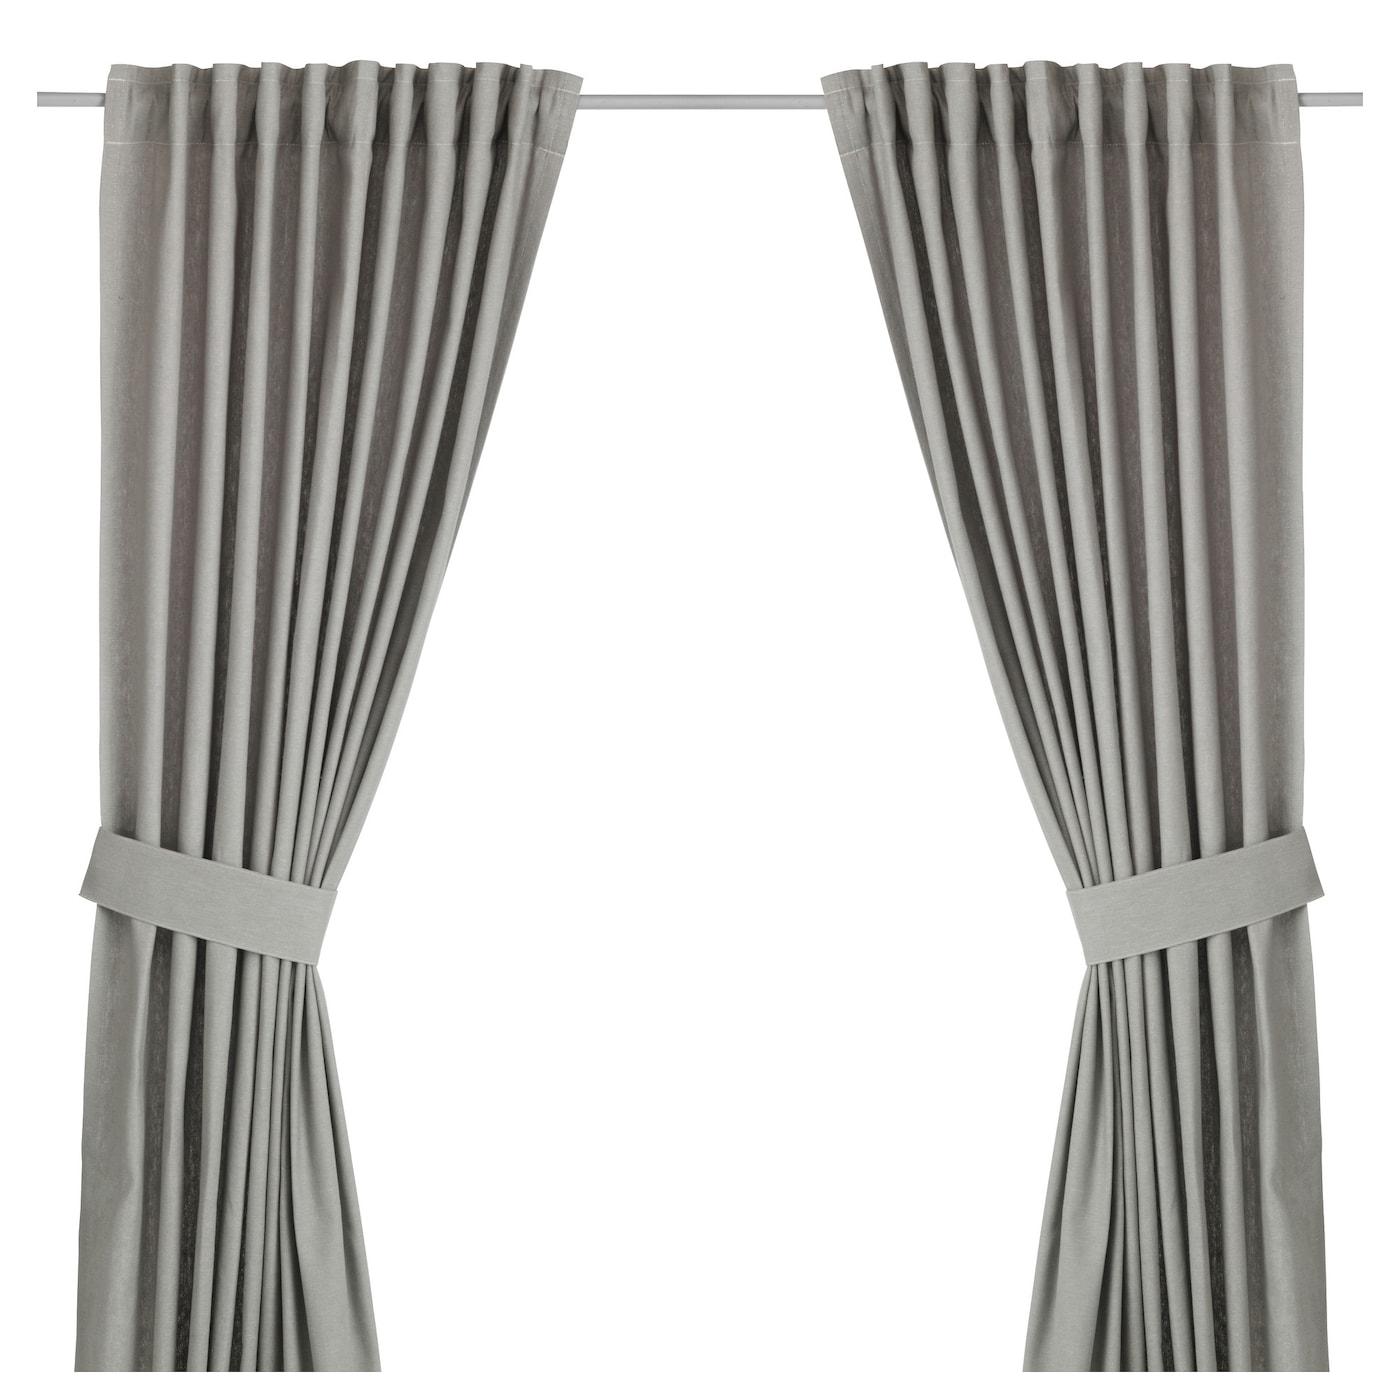 Vorhang Ikea ingert 2 gardinen raffhalter ikea